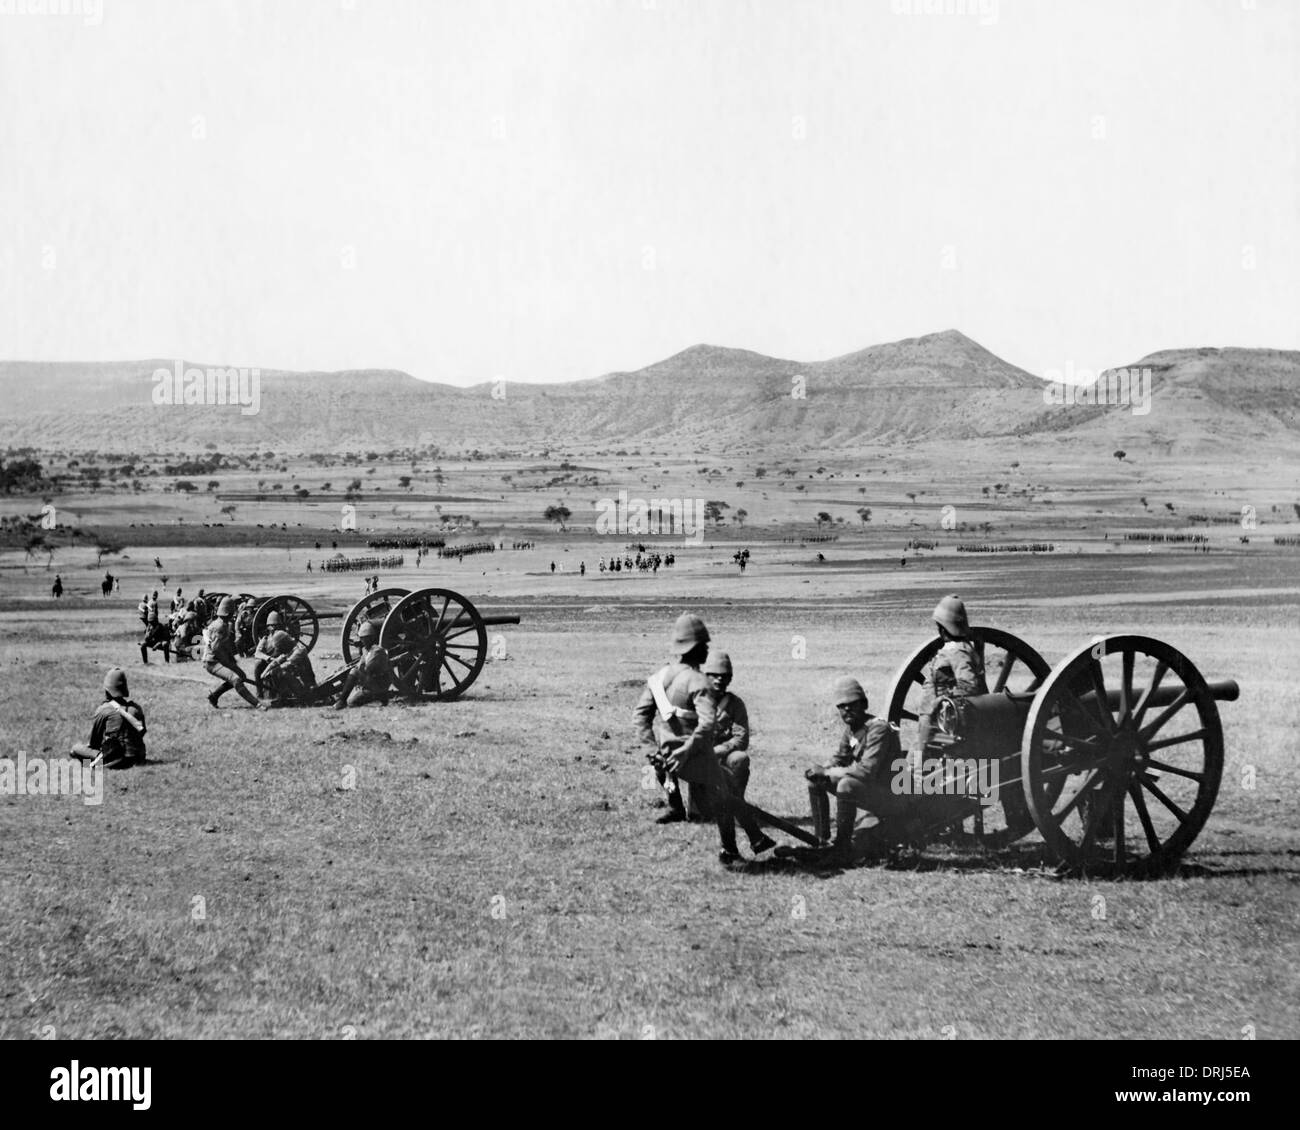 Artillery exercise, India - Stock Image